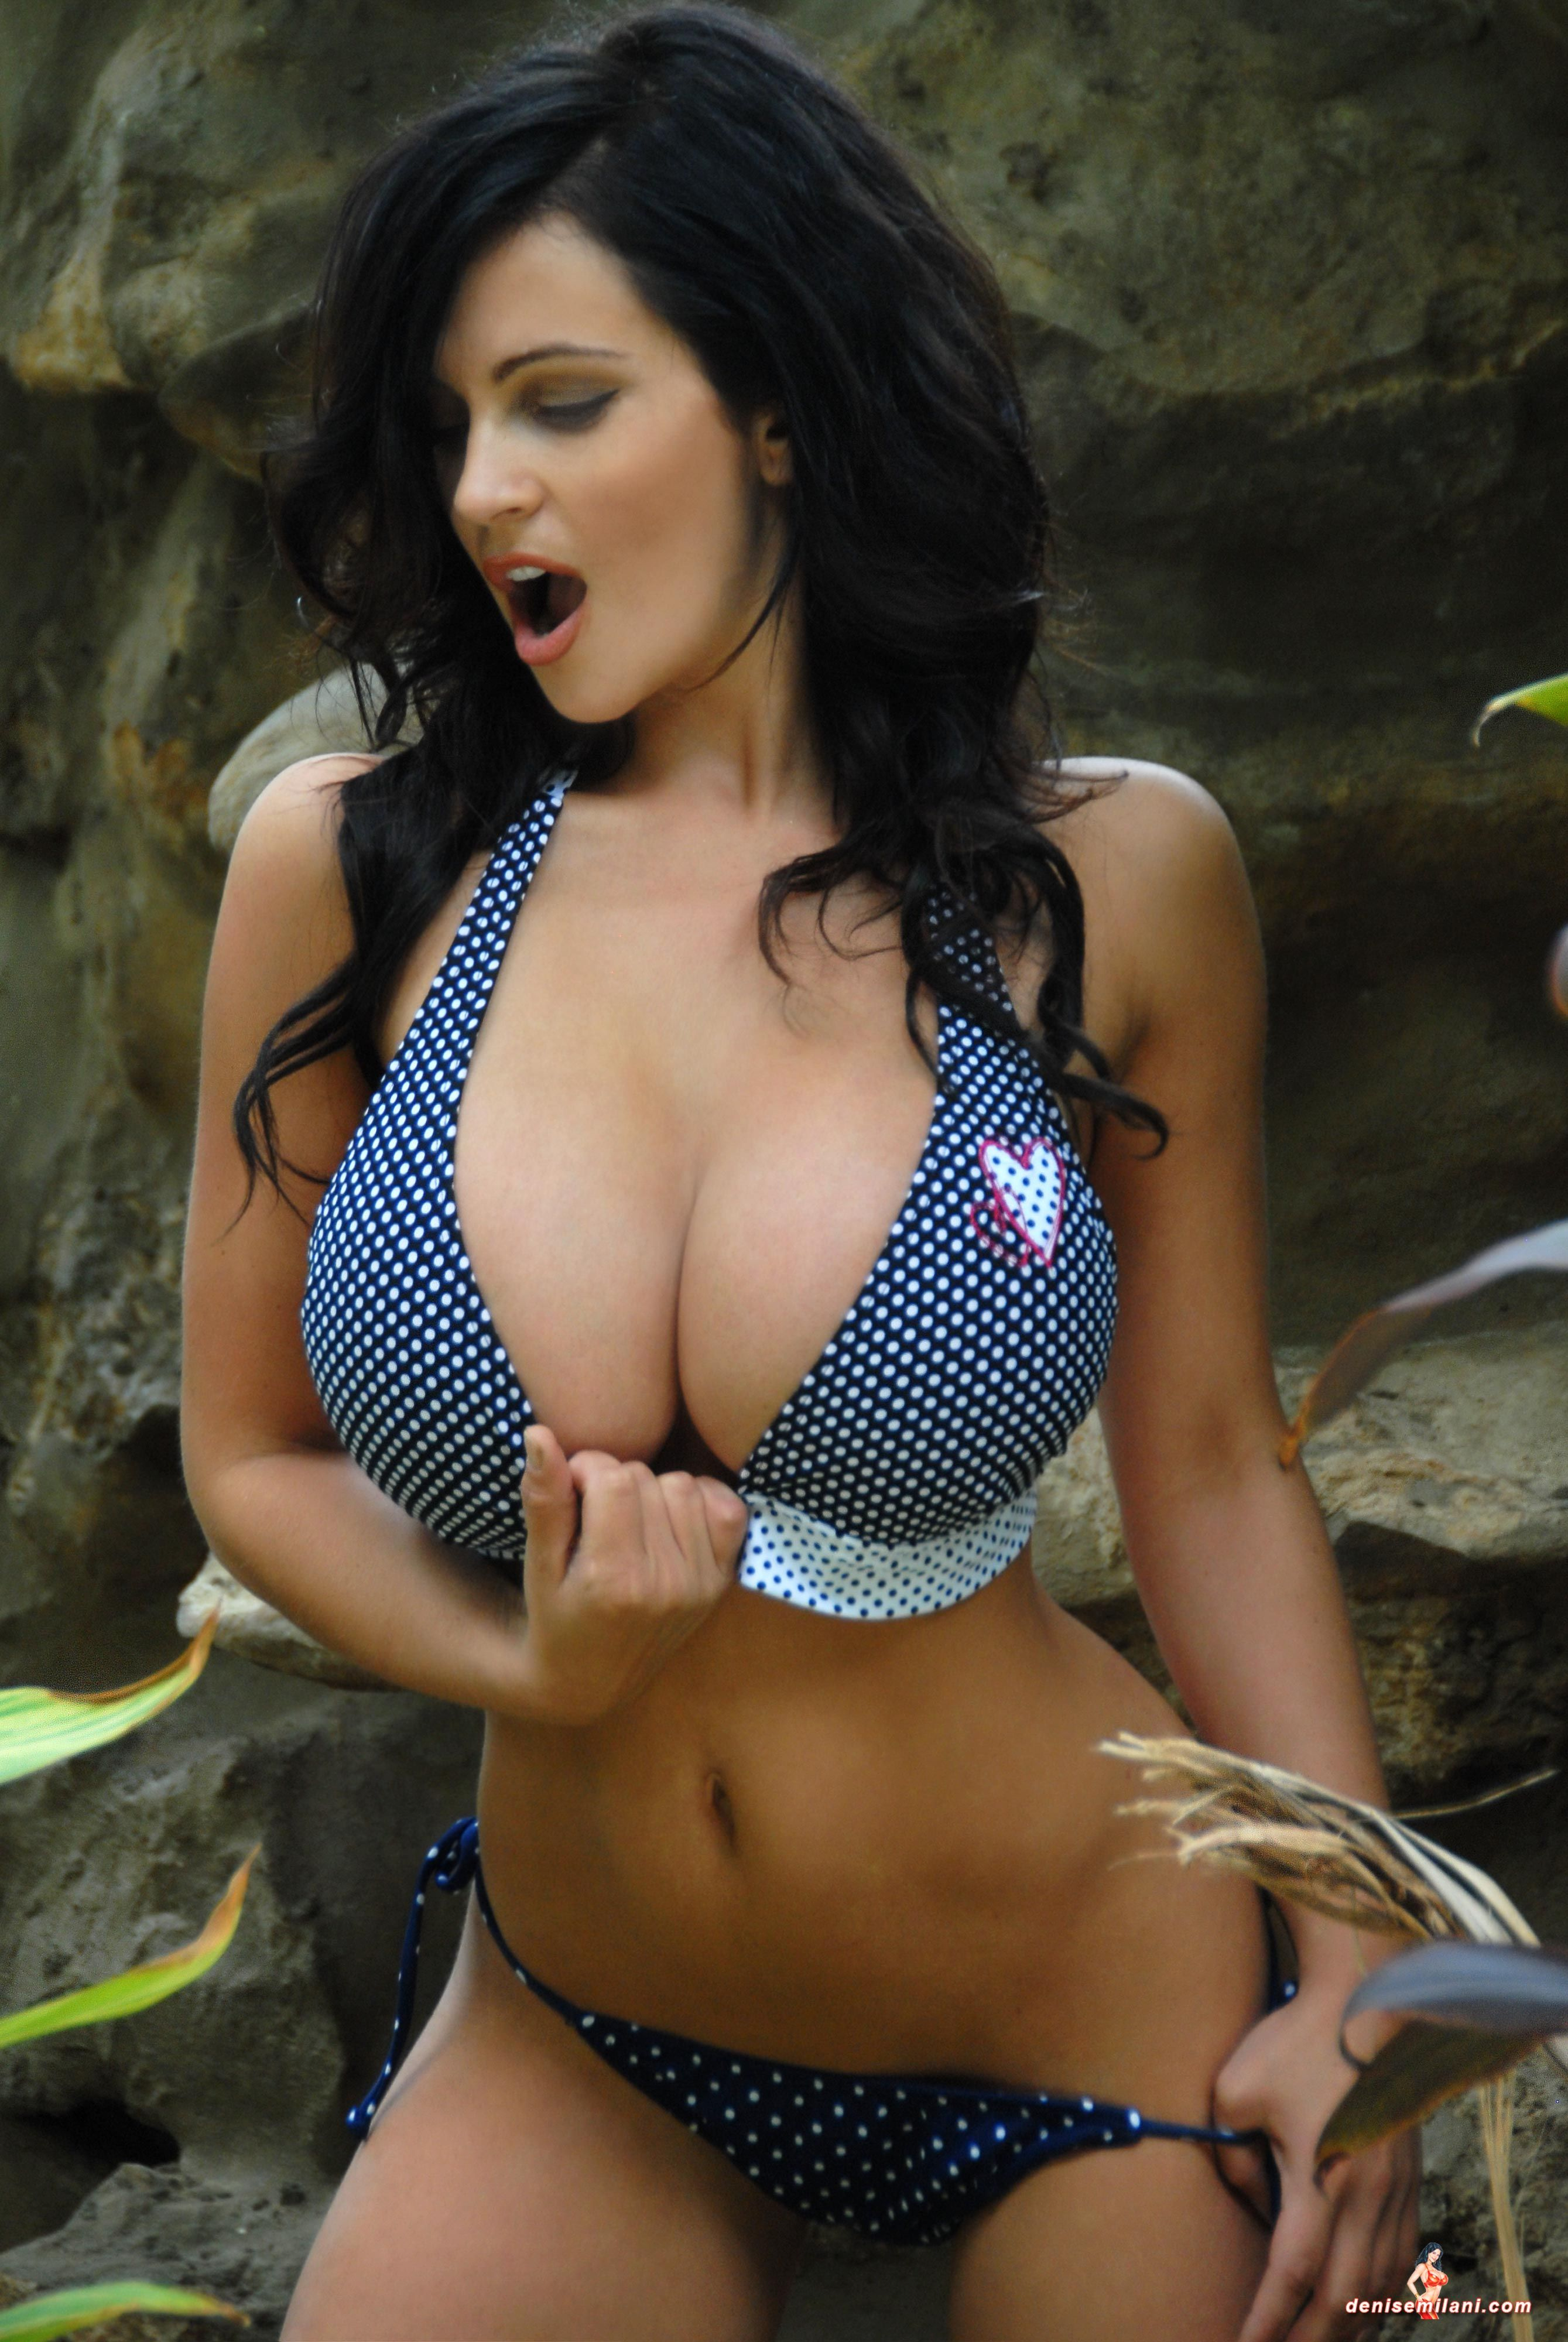 Denise milani hot bikini think, that